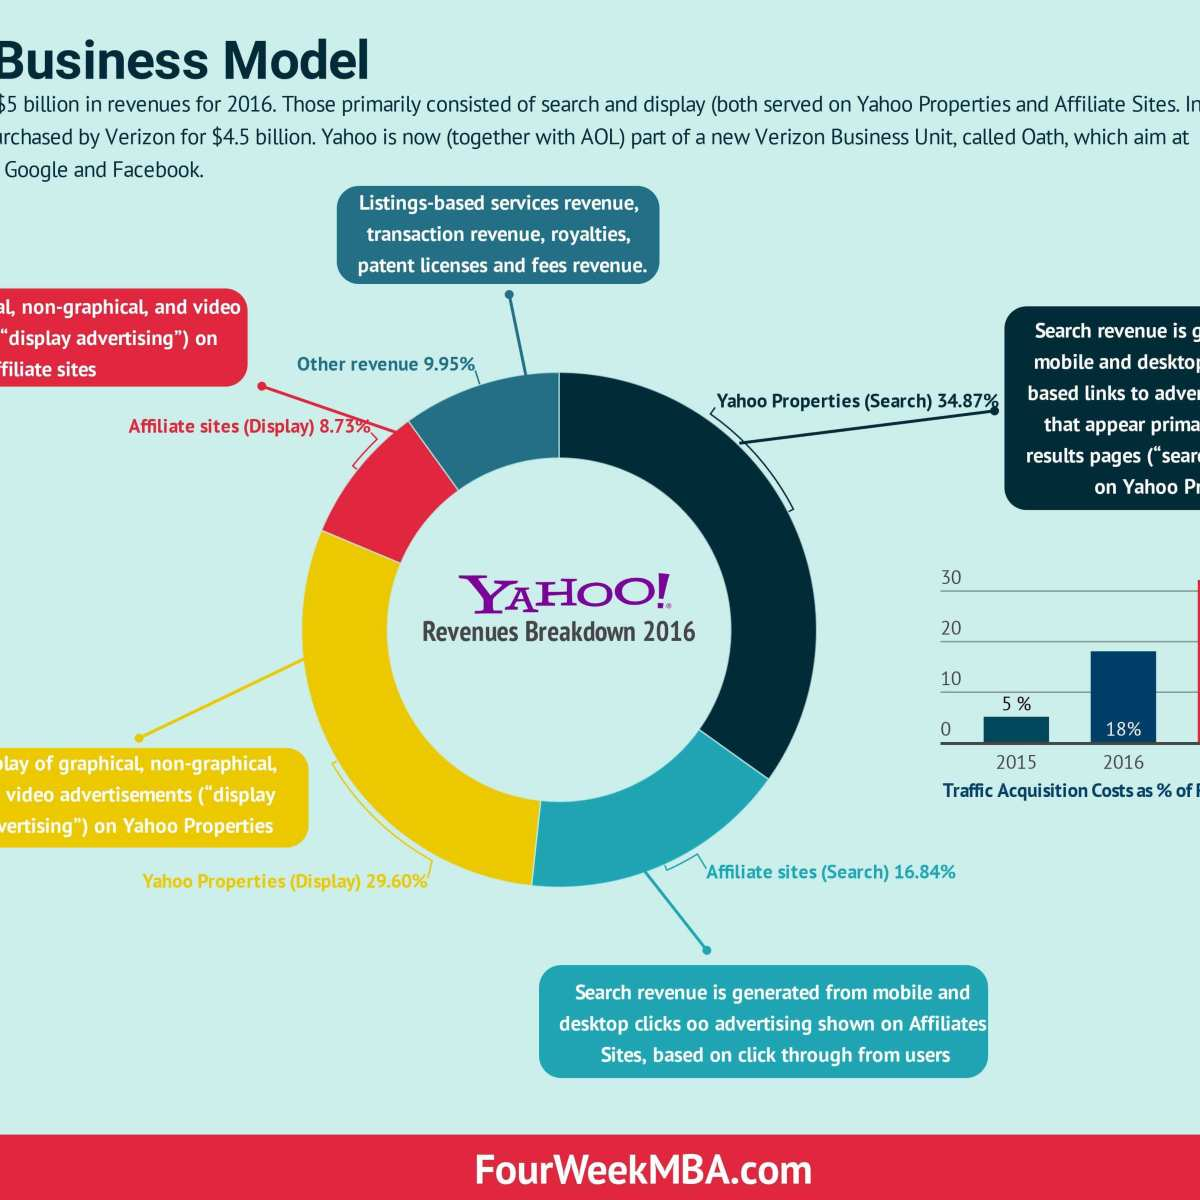 How Does Yahoo Make Money? Yahoo Search Business Model - FourWeekMBA